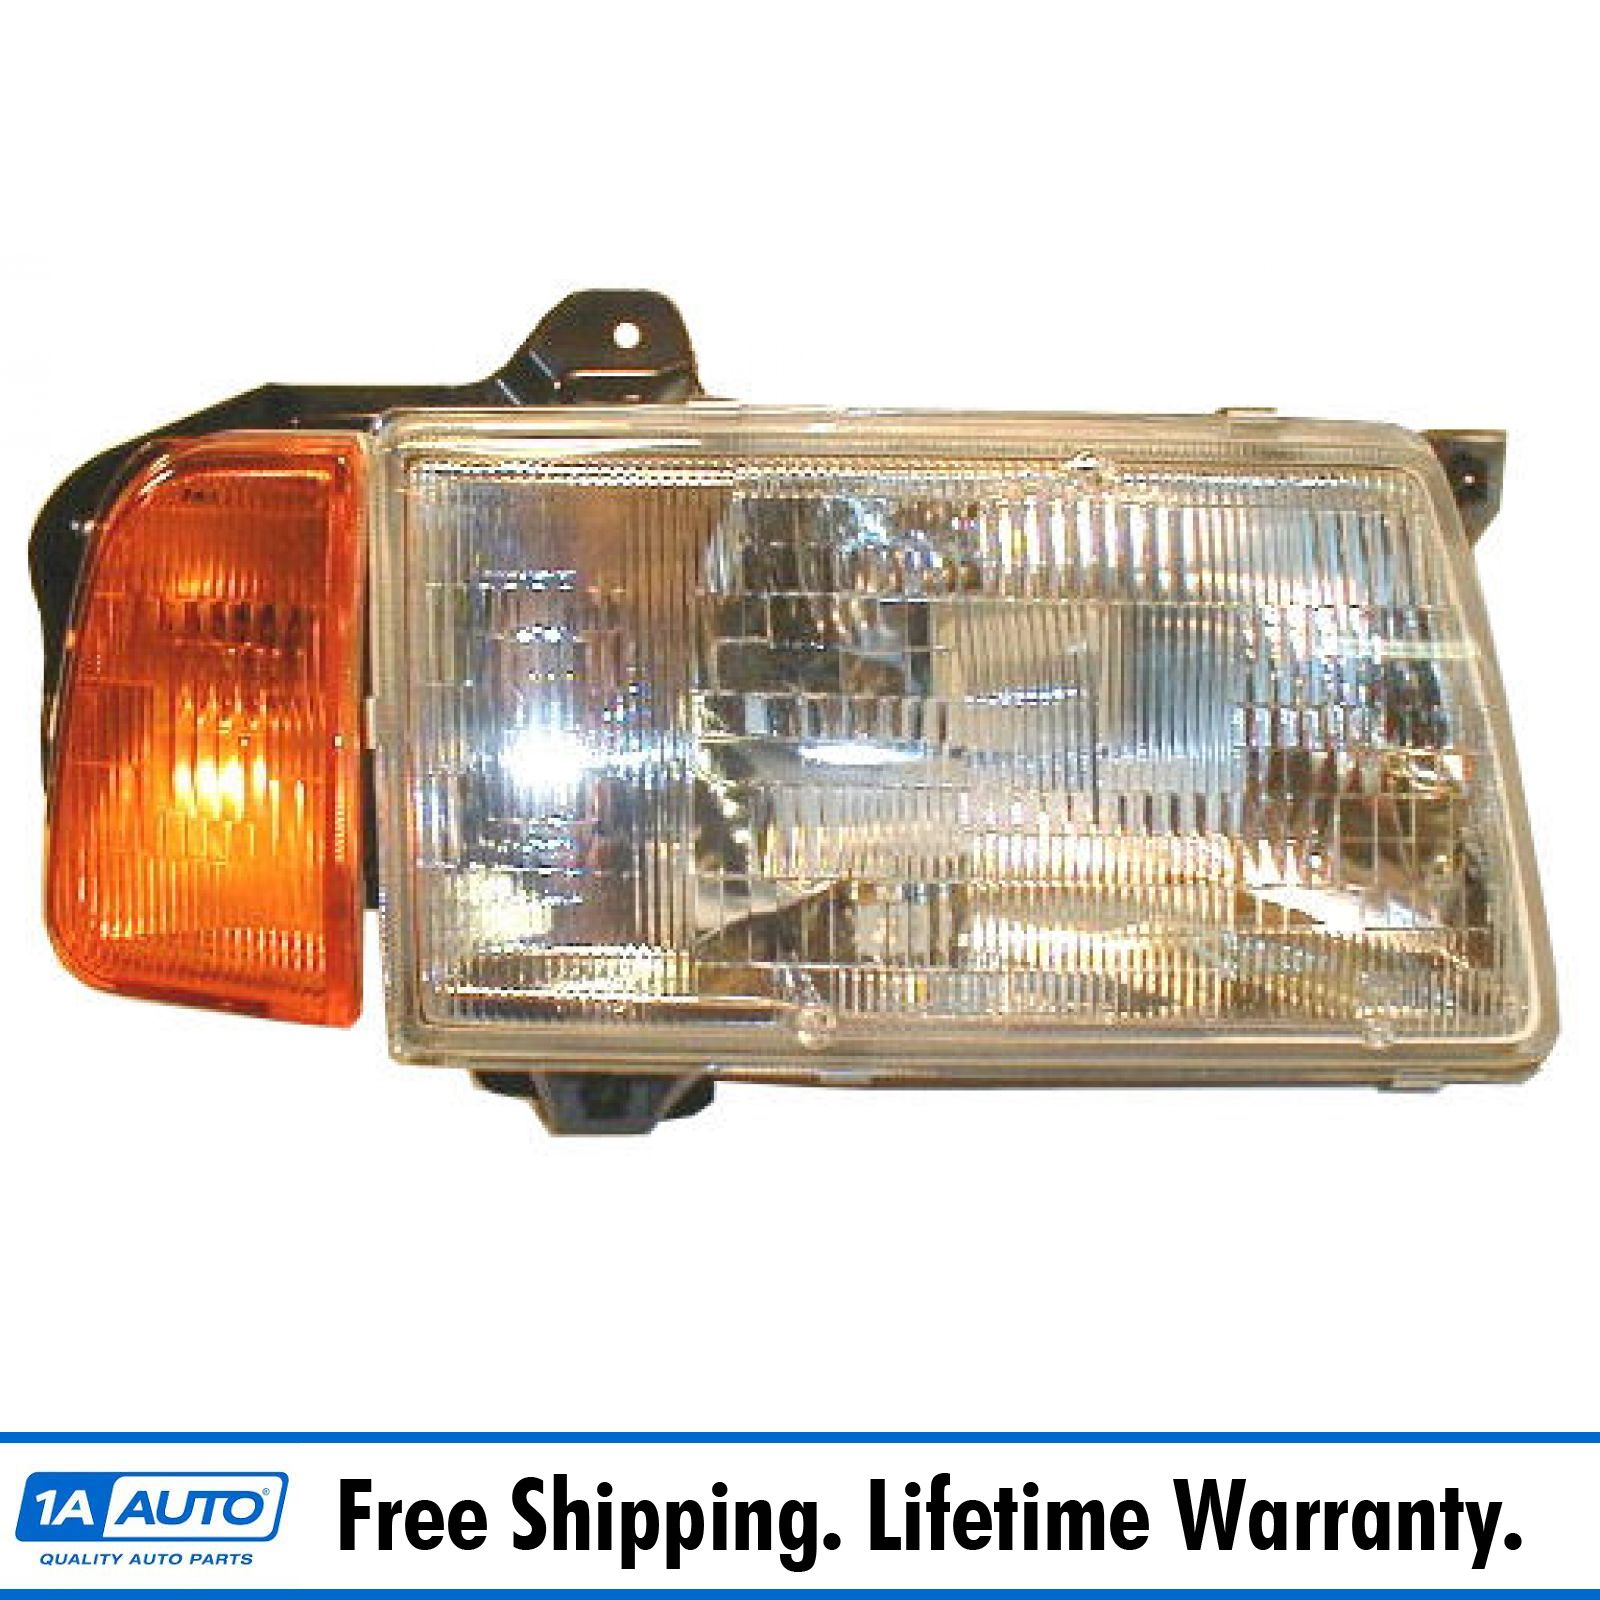 Depo 318-1102R-ASC Suzuki Sidekick Passenger Side Replacement Headlight Assembly with Corner Light